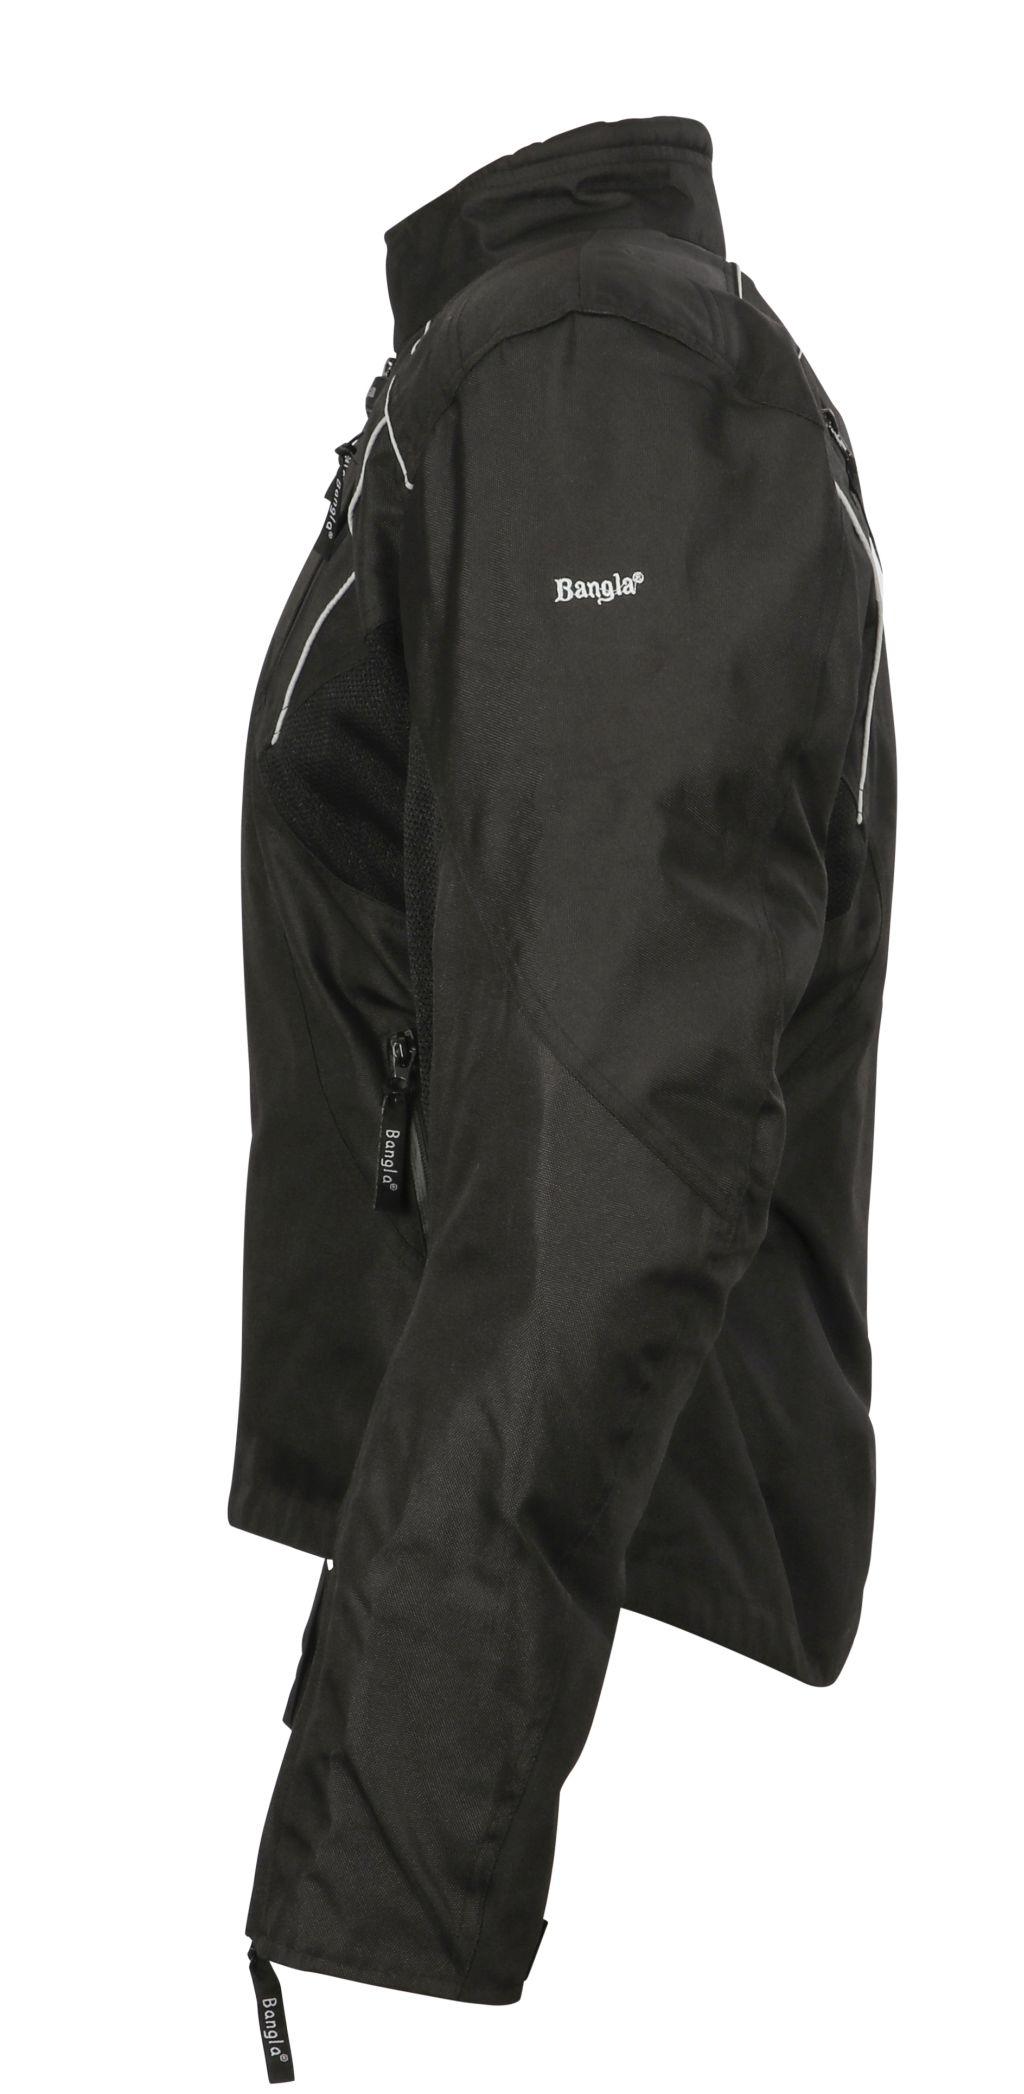 Sommer Motorradjacke Textil Jacke Cordura Quad Roller Schwarz Kurz M - 4 XL